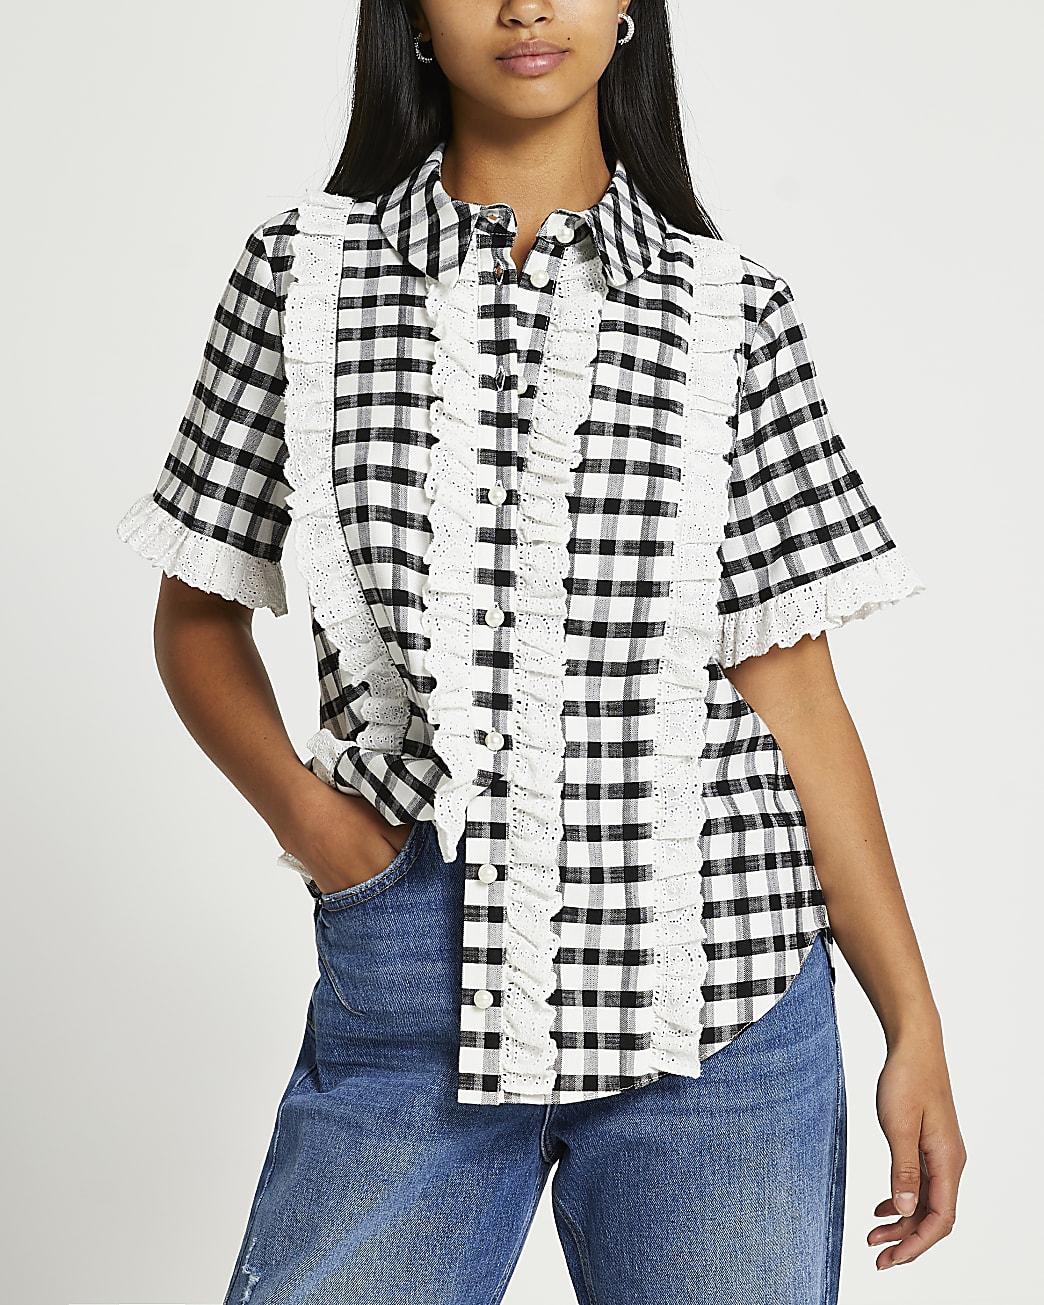 Petite black short sleeve frill checked shirt